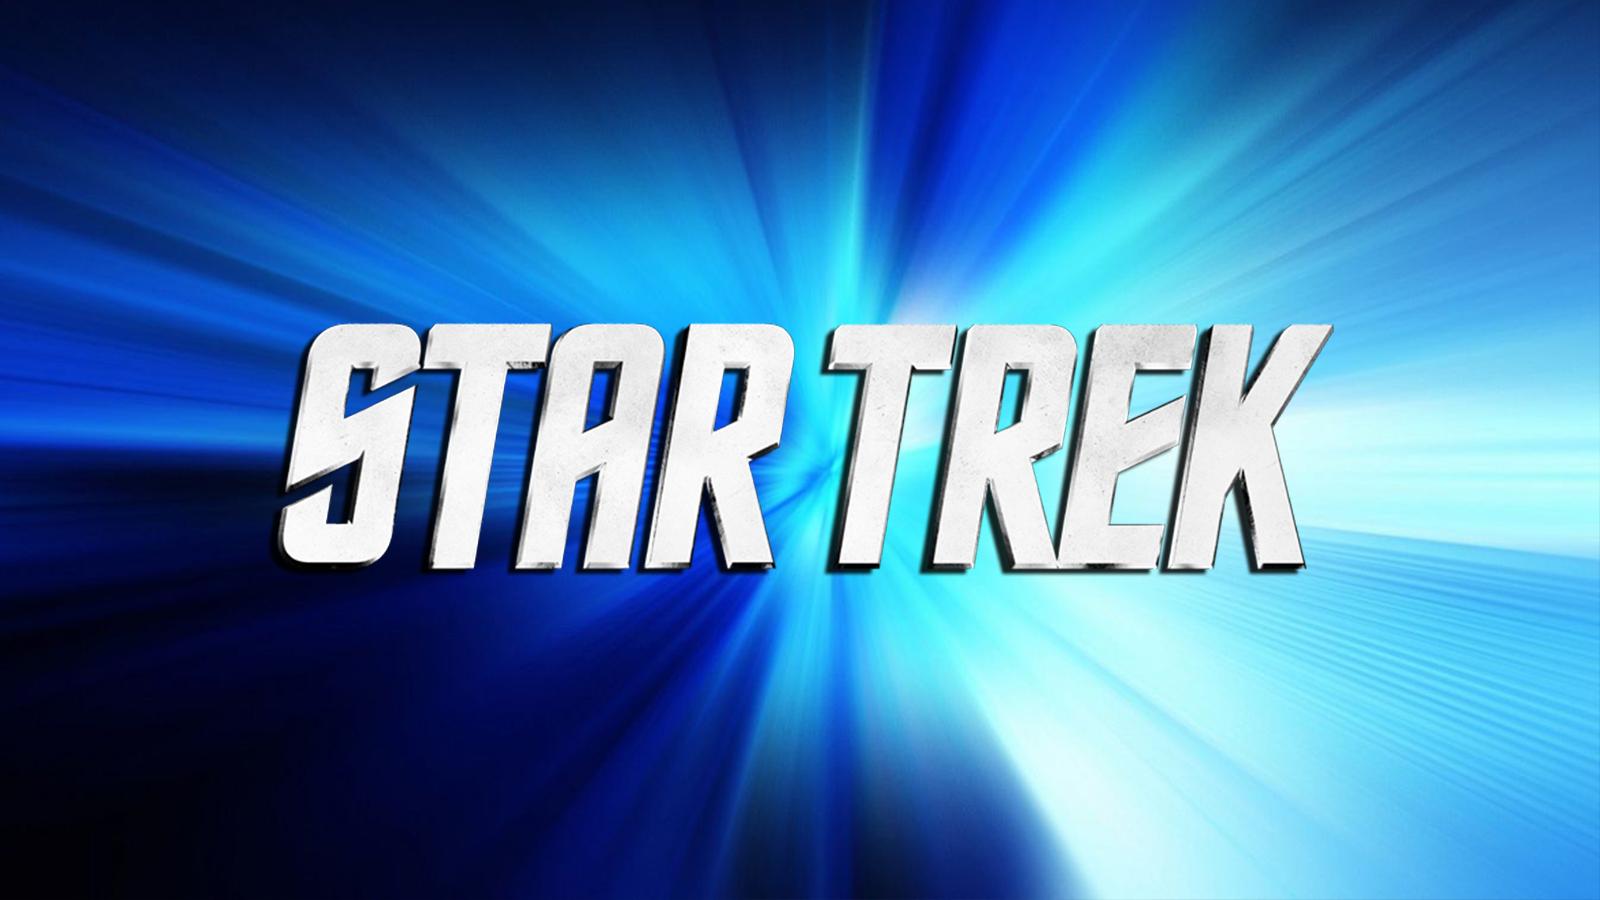 New Star Trek Feature Film Scheduled For Release In June 2023